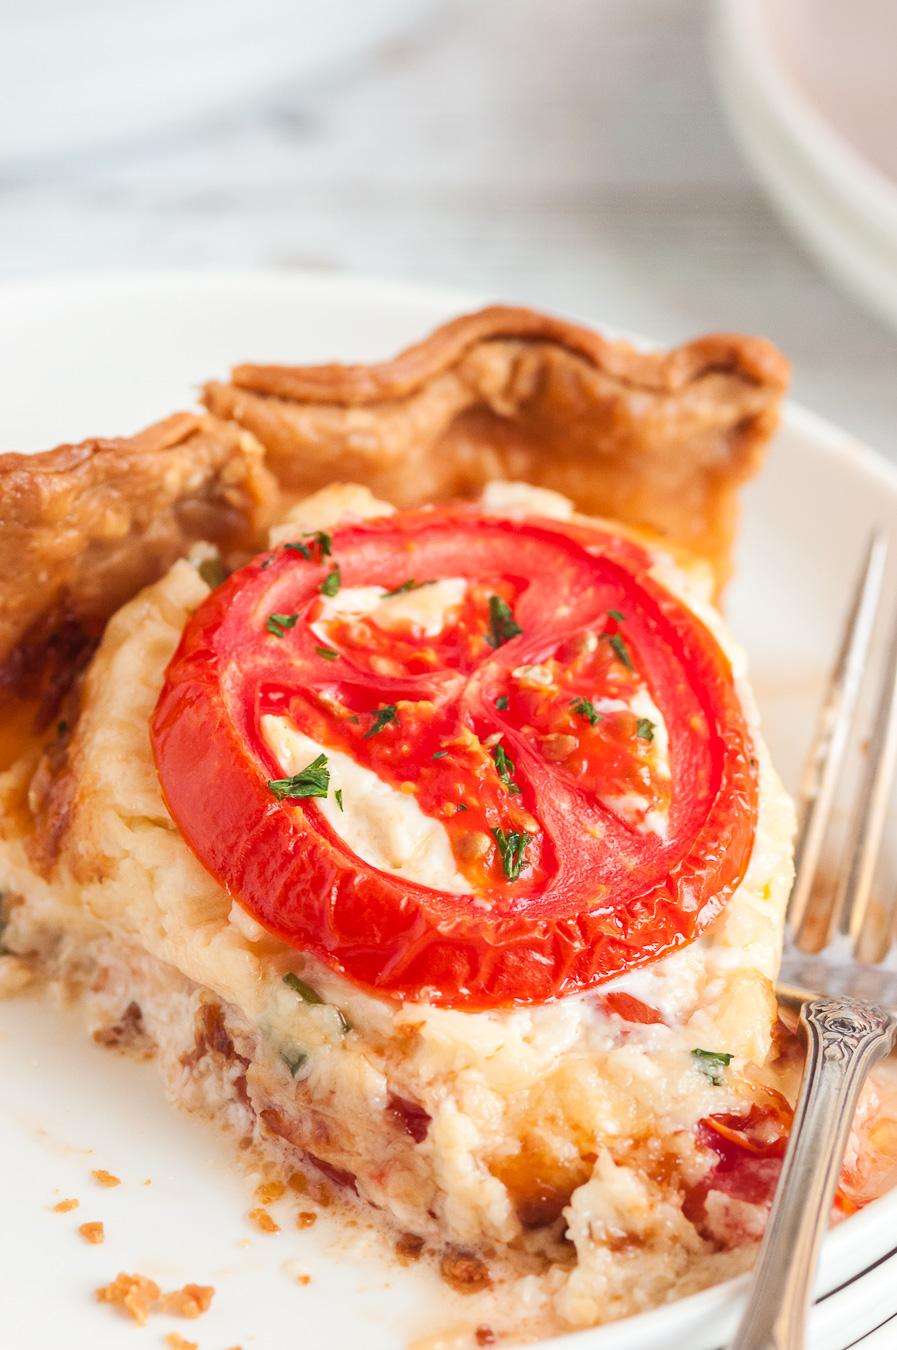 tomato pie slice up close with fresh tomato garnish